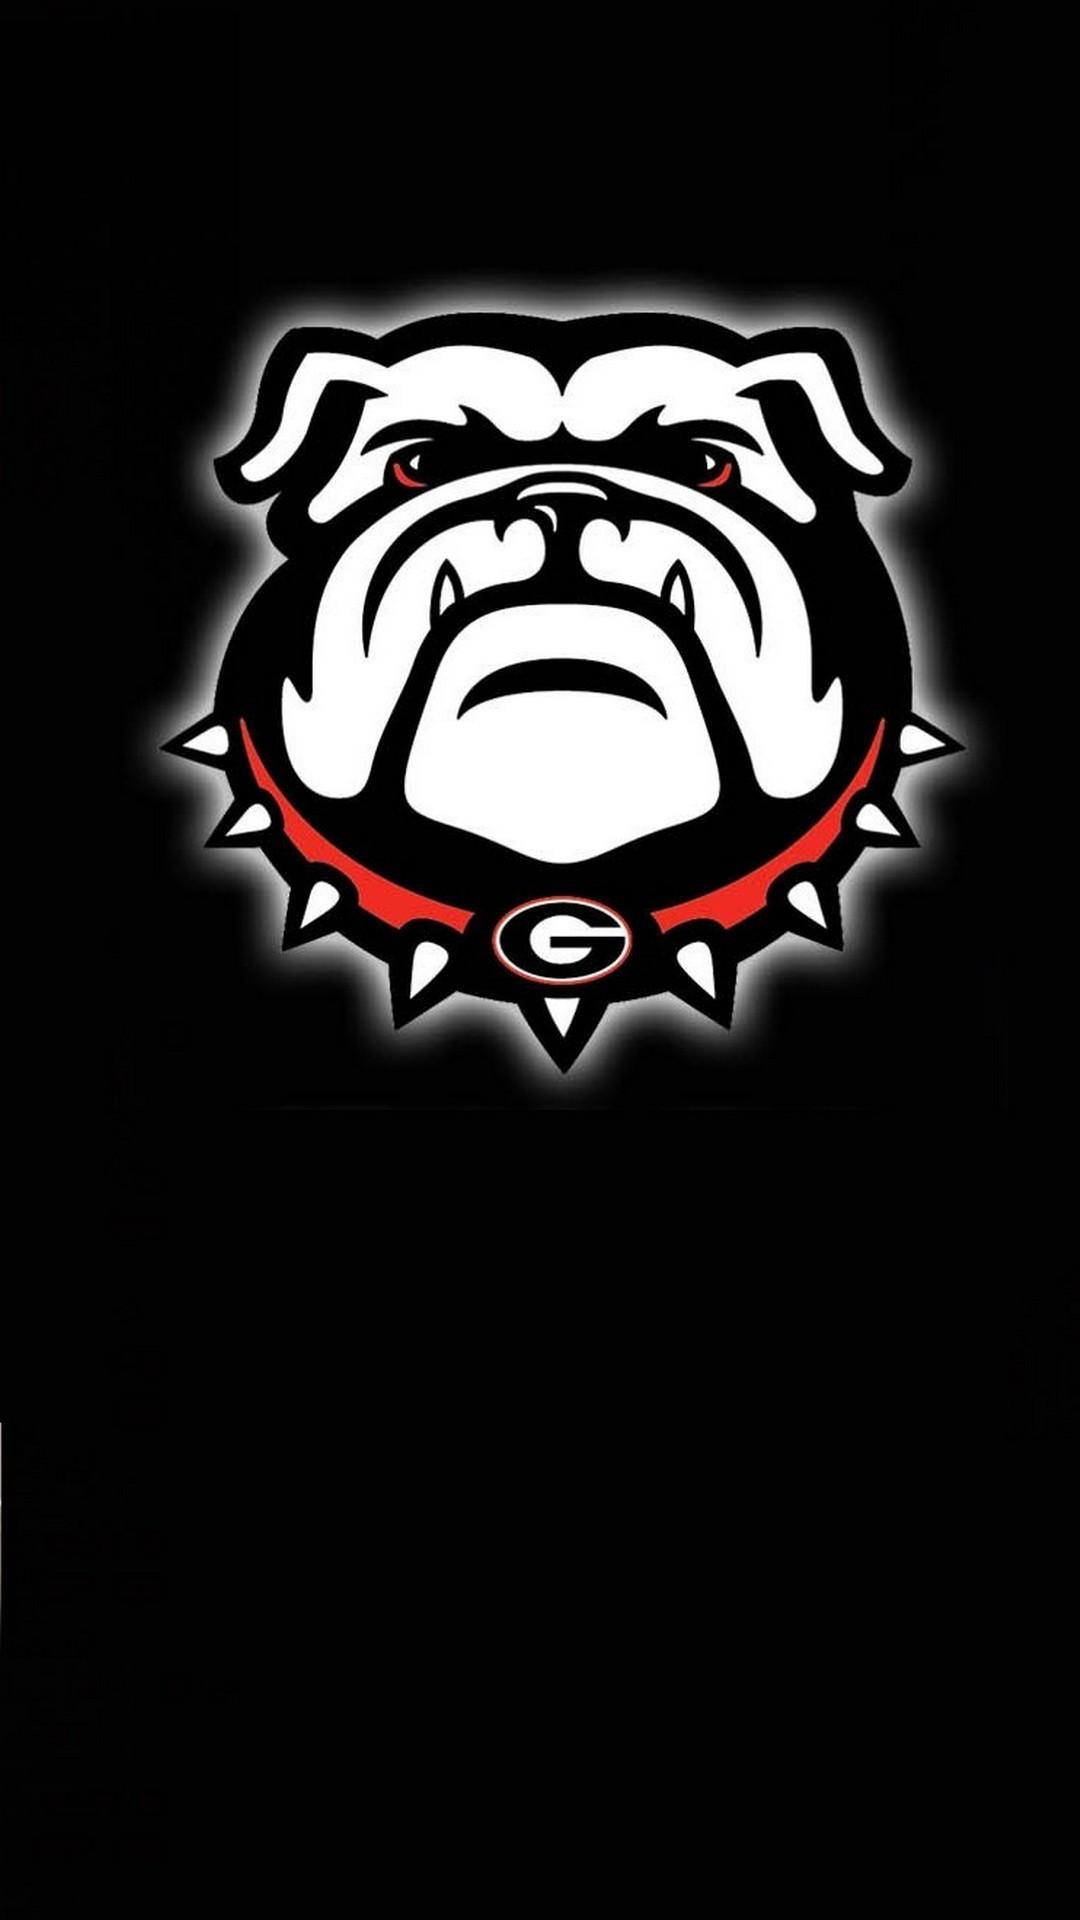 1080x1920 Wallpaper Georgia Bulldogs IPhone Resolution